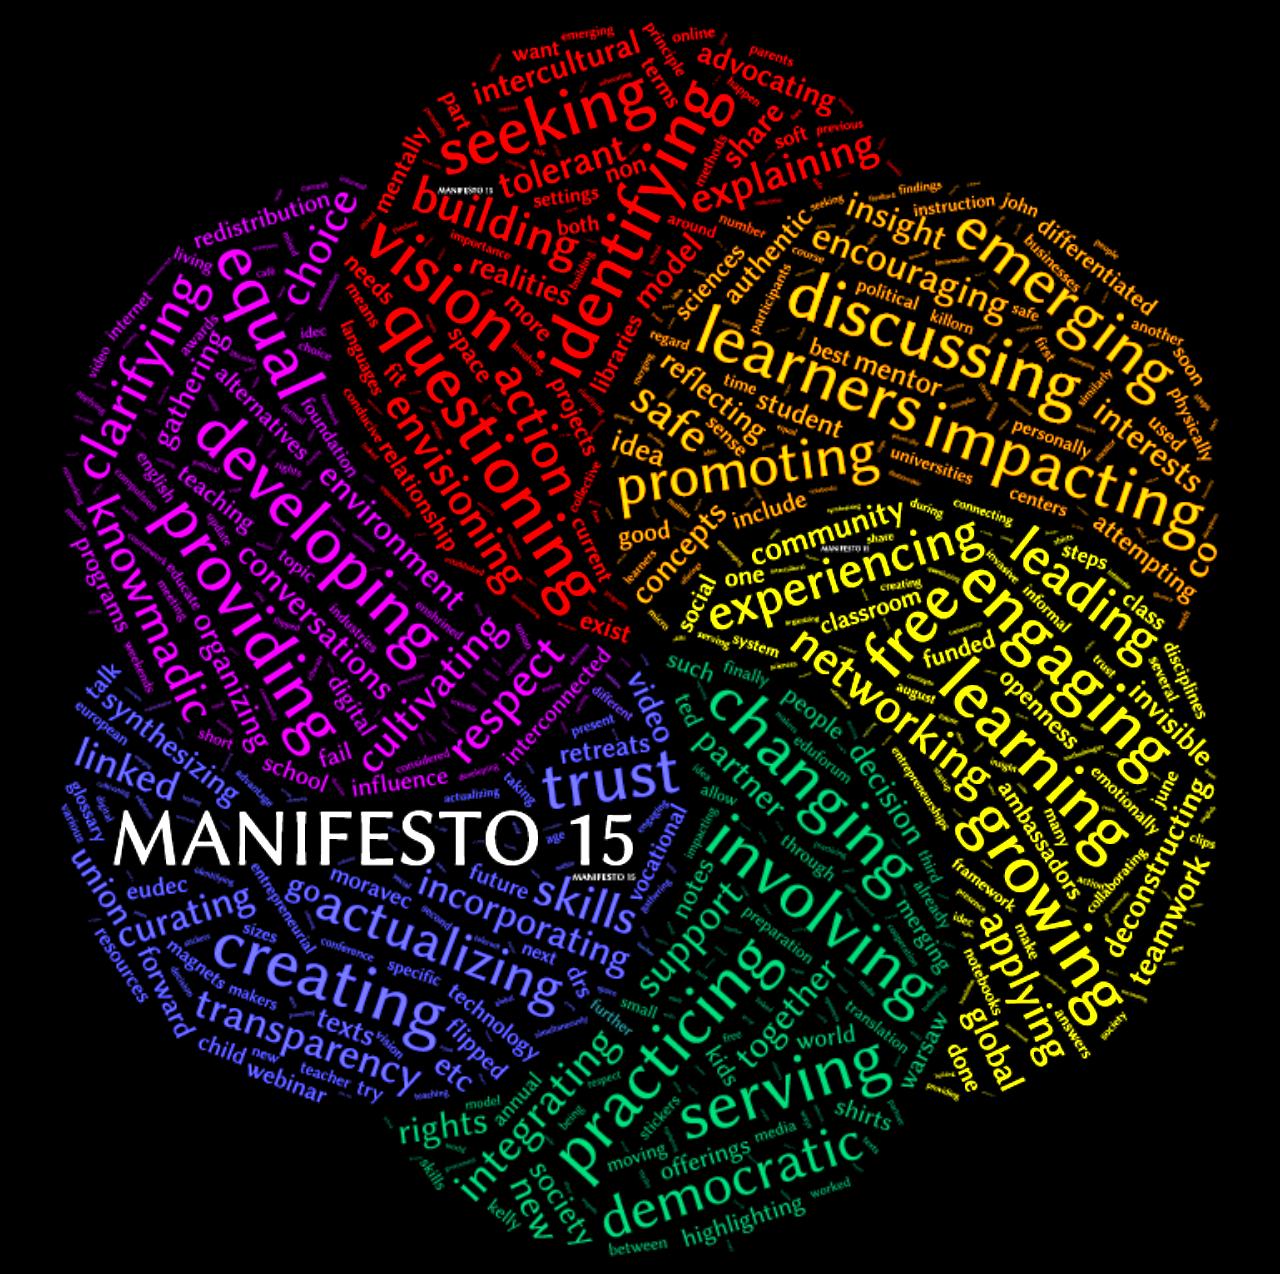 manifesto15-eudec.png